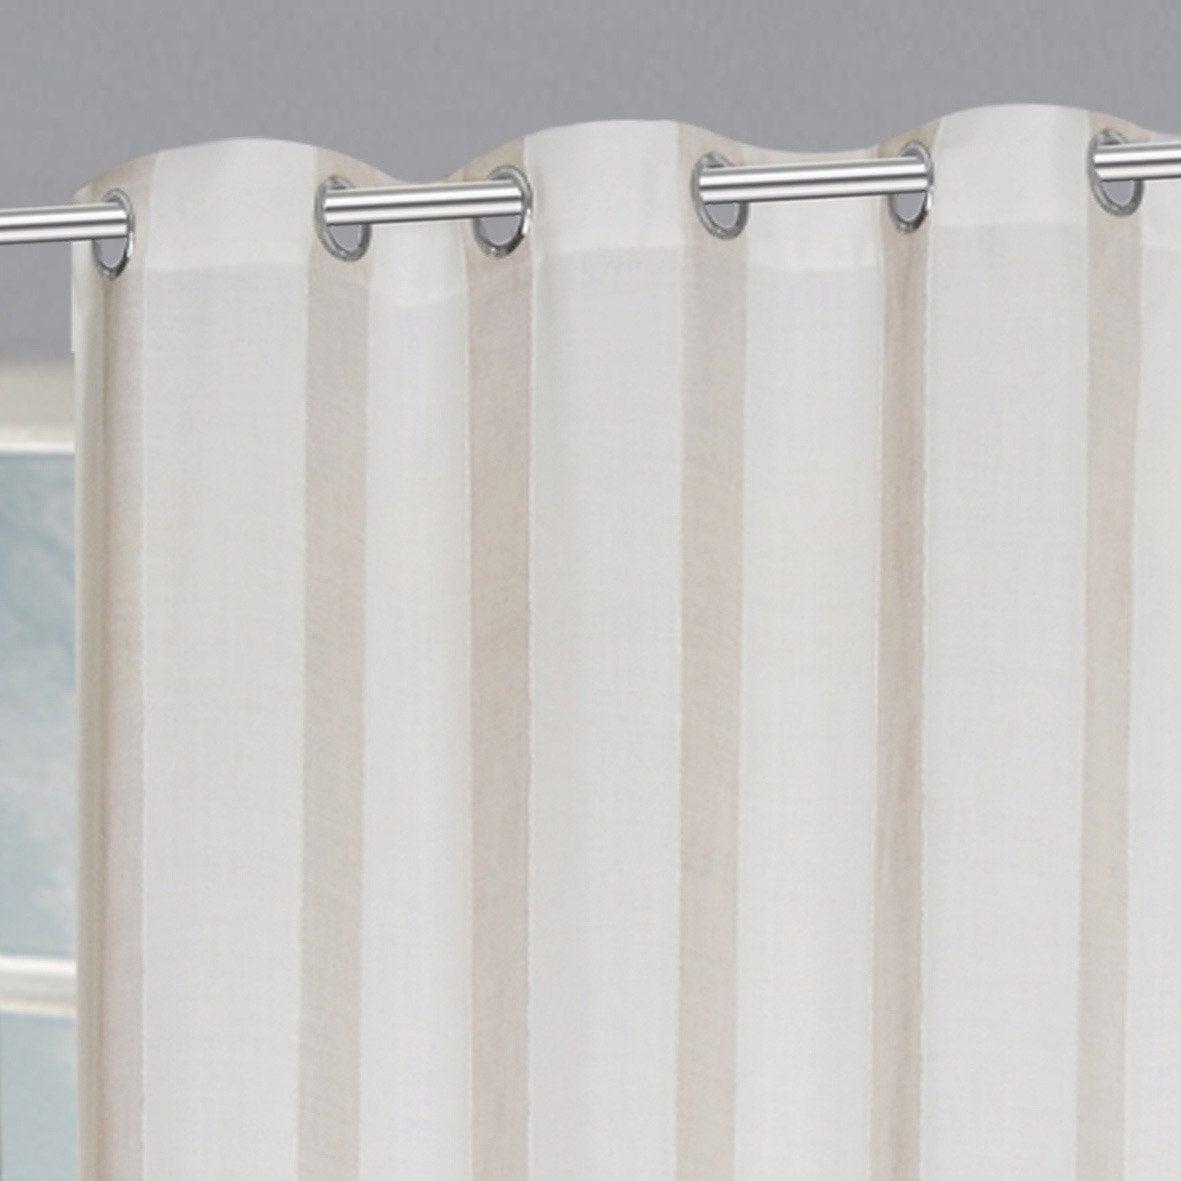 Rideau tamisant, Madina, banc/beige, l.140 x H.260 cm INSPIRE